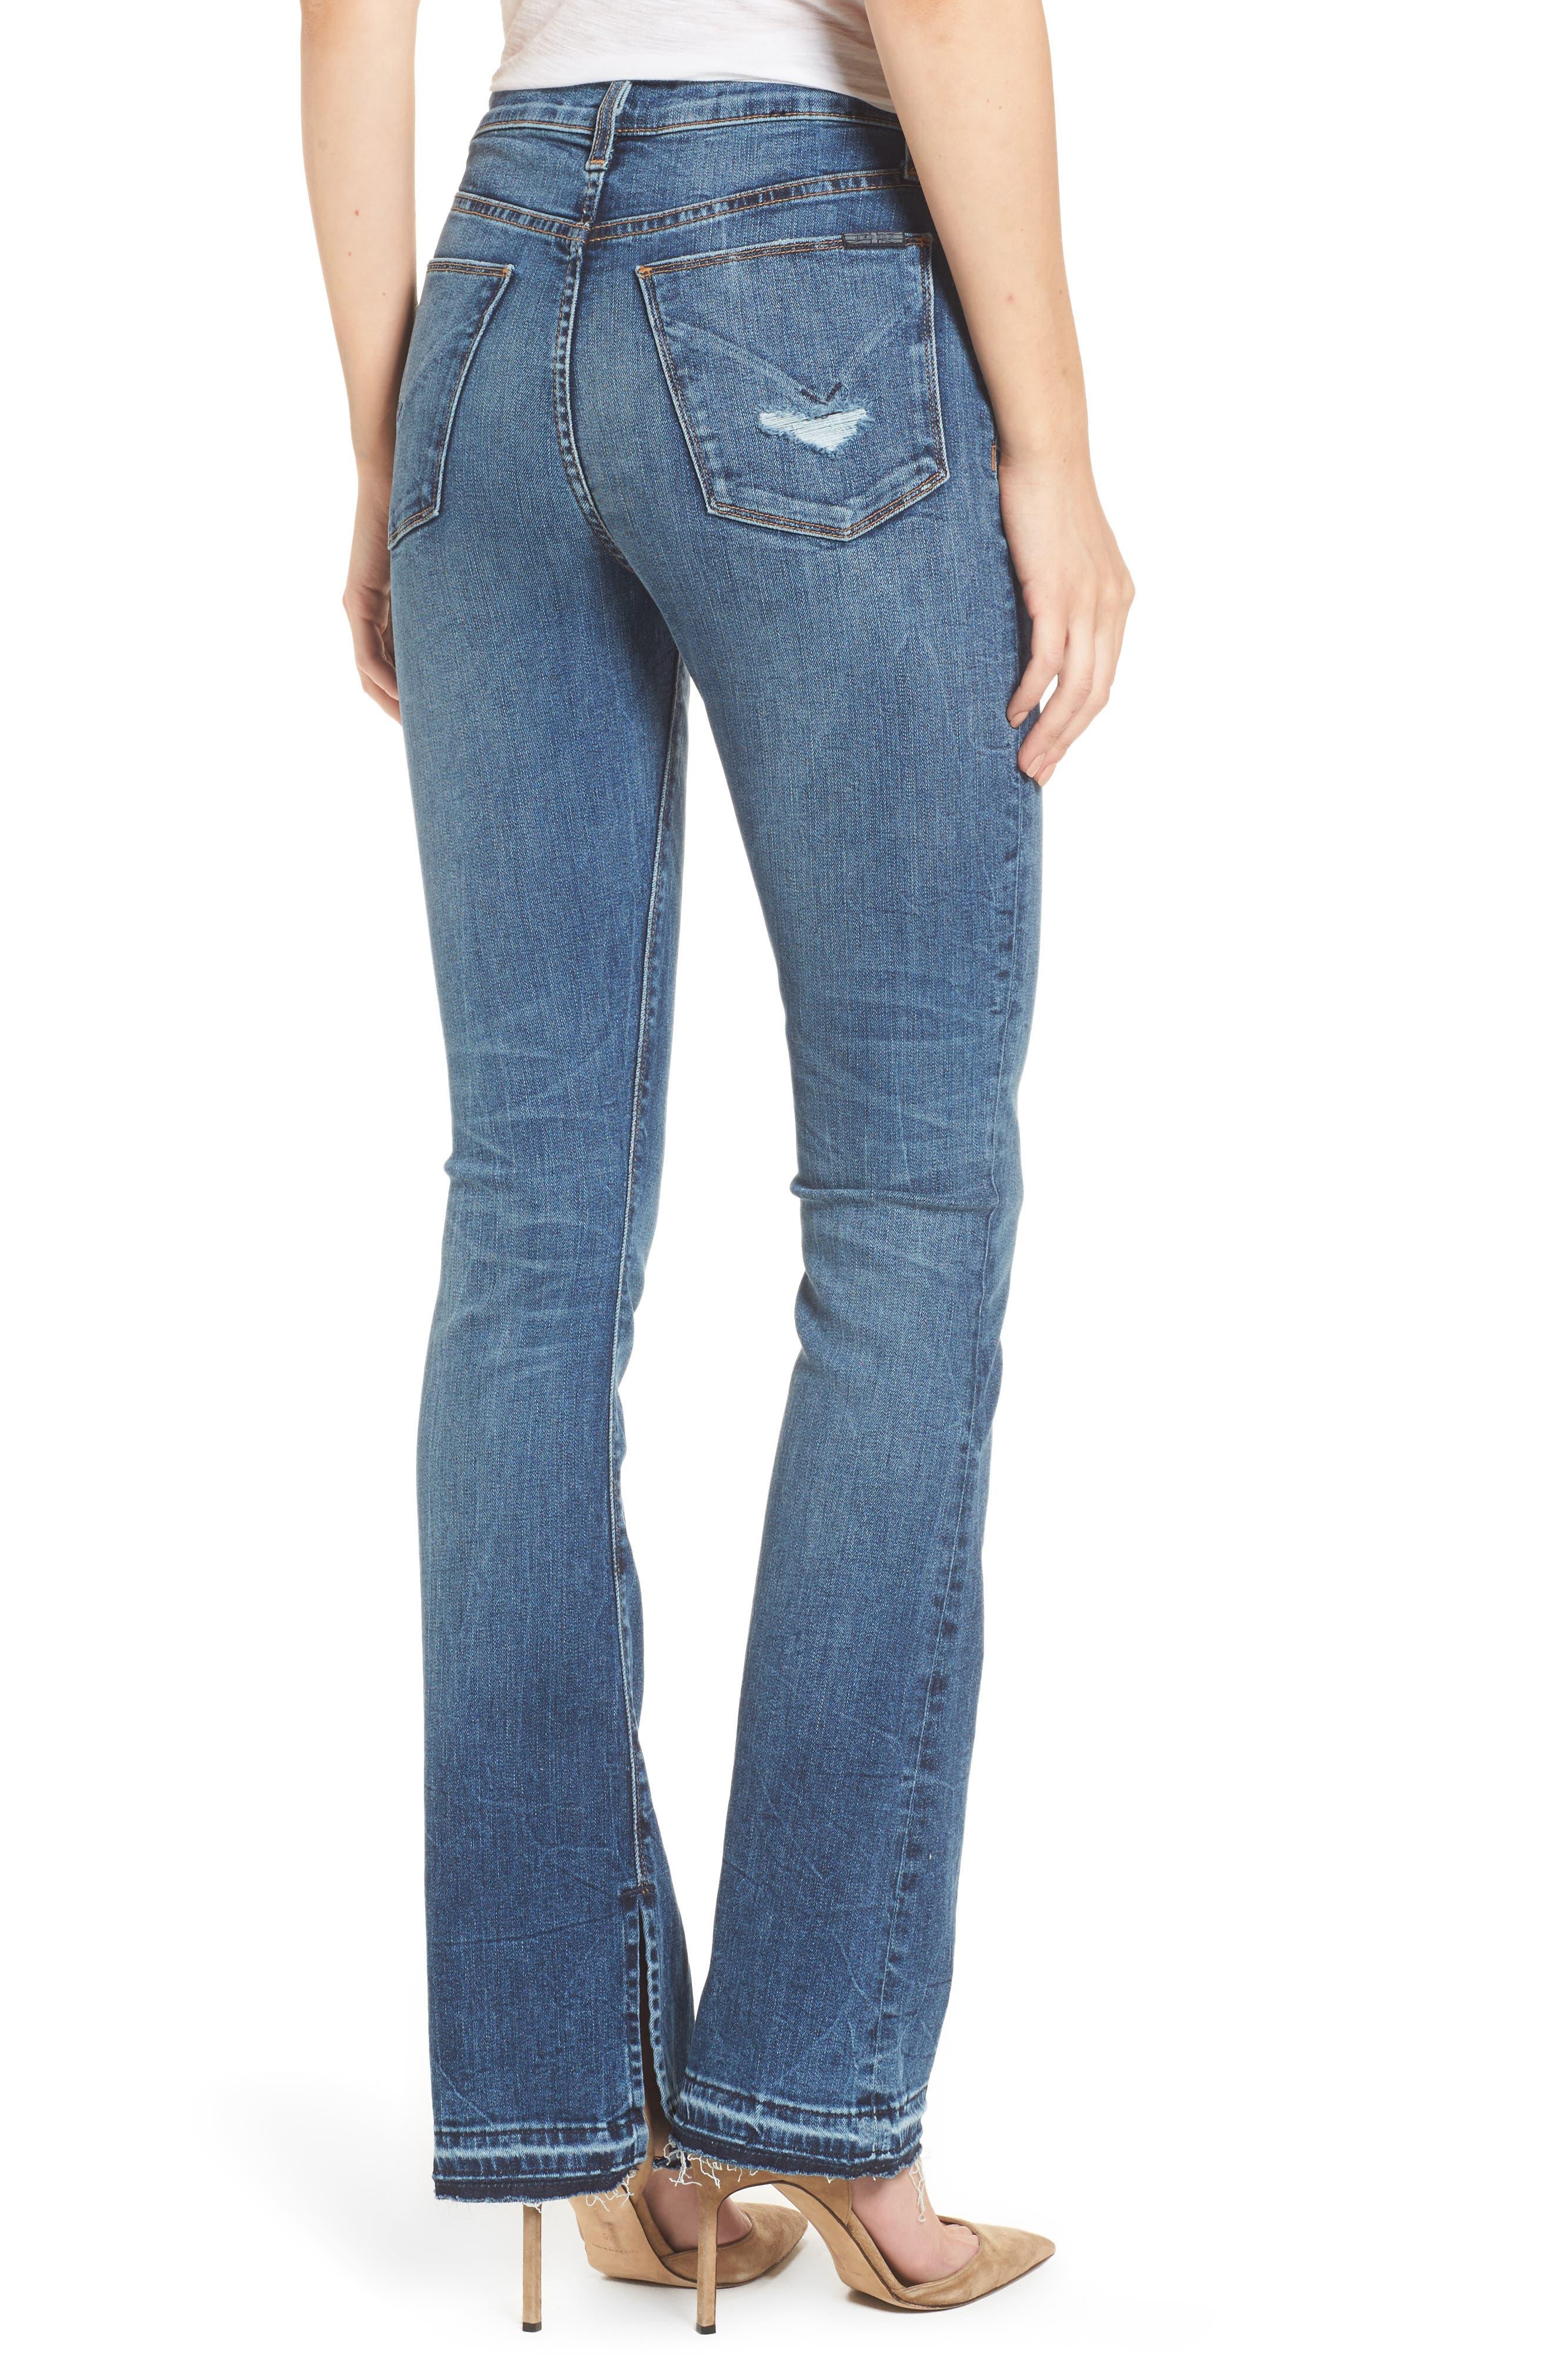 Heartbreaker High Waist Bootcut Jeans,                             Alternate thumbnail 2, color,                             SPLIT SECOND